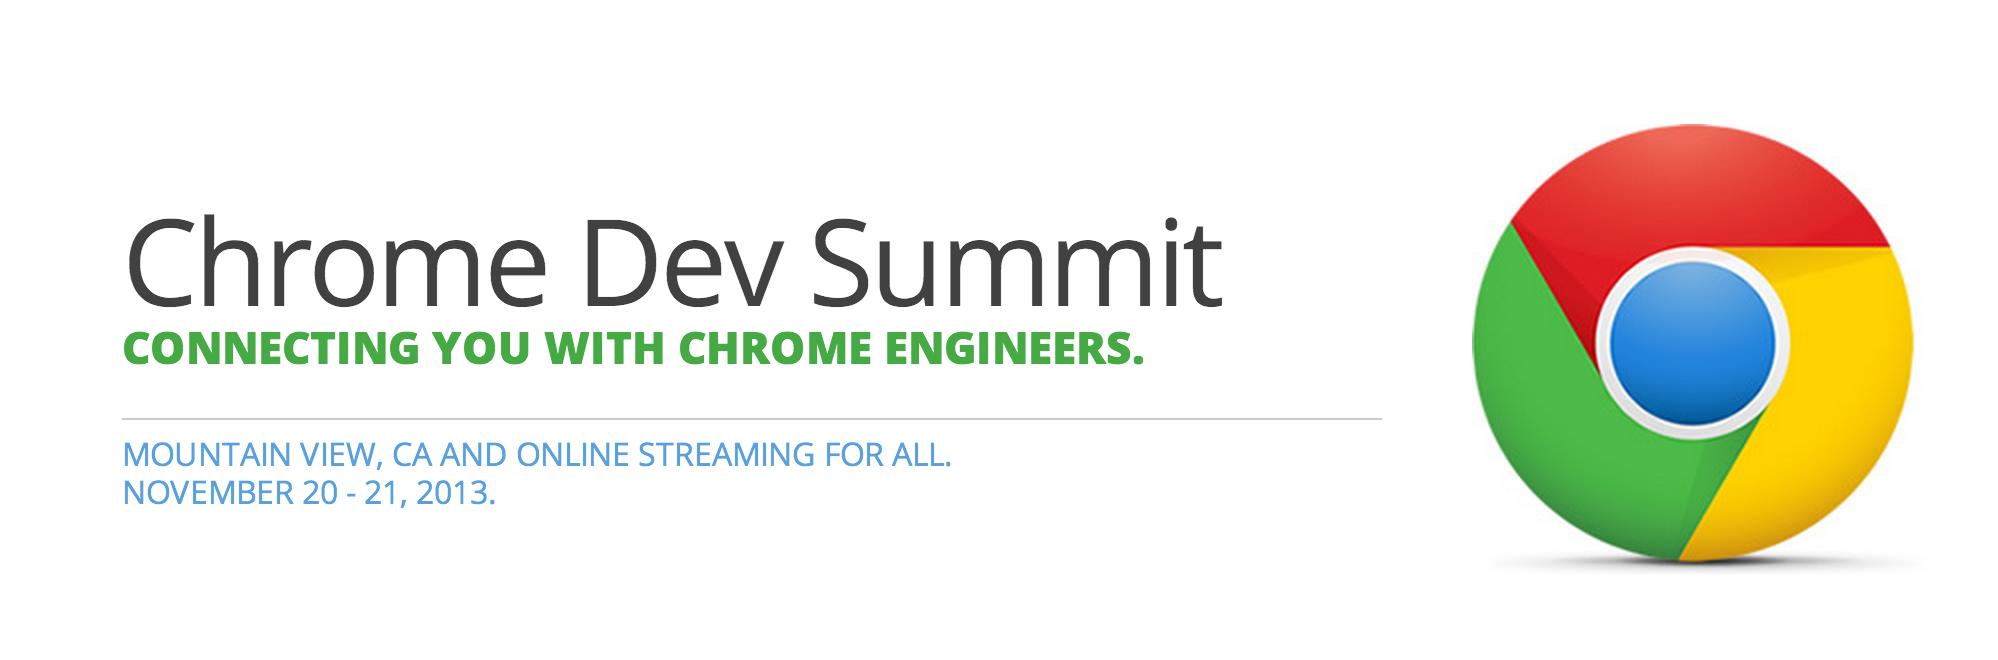 Chrome-Dev-Summit